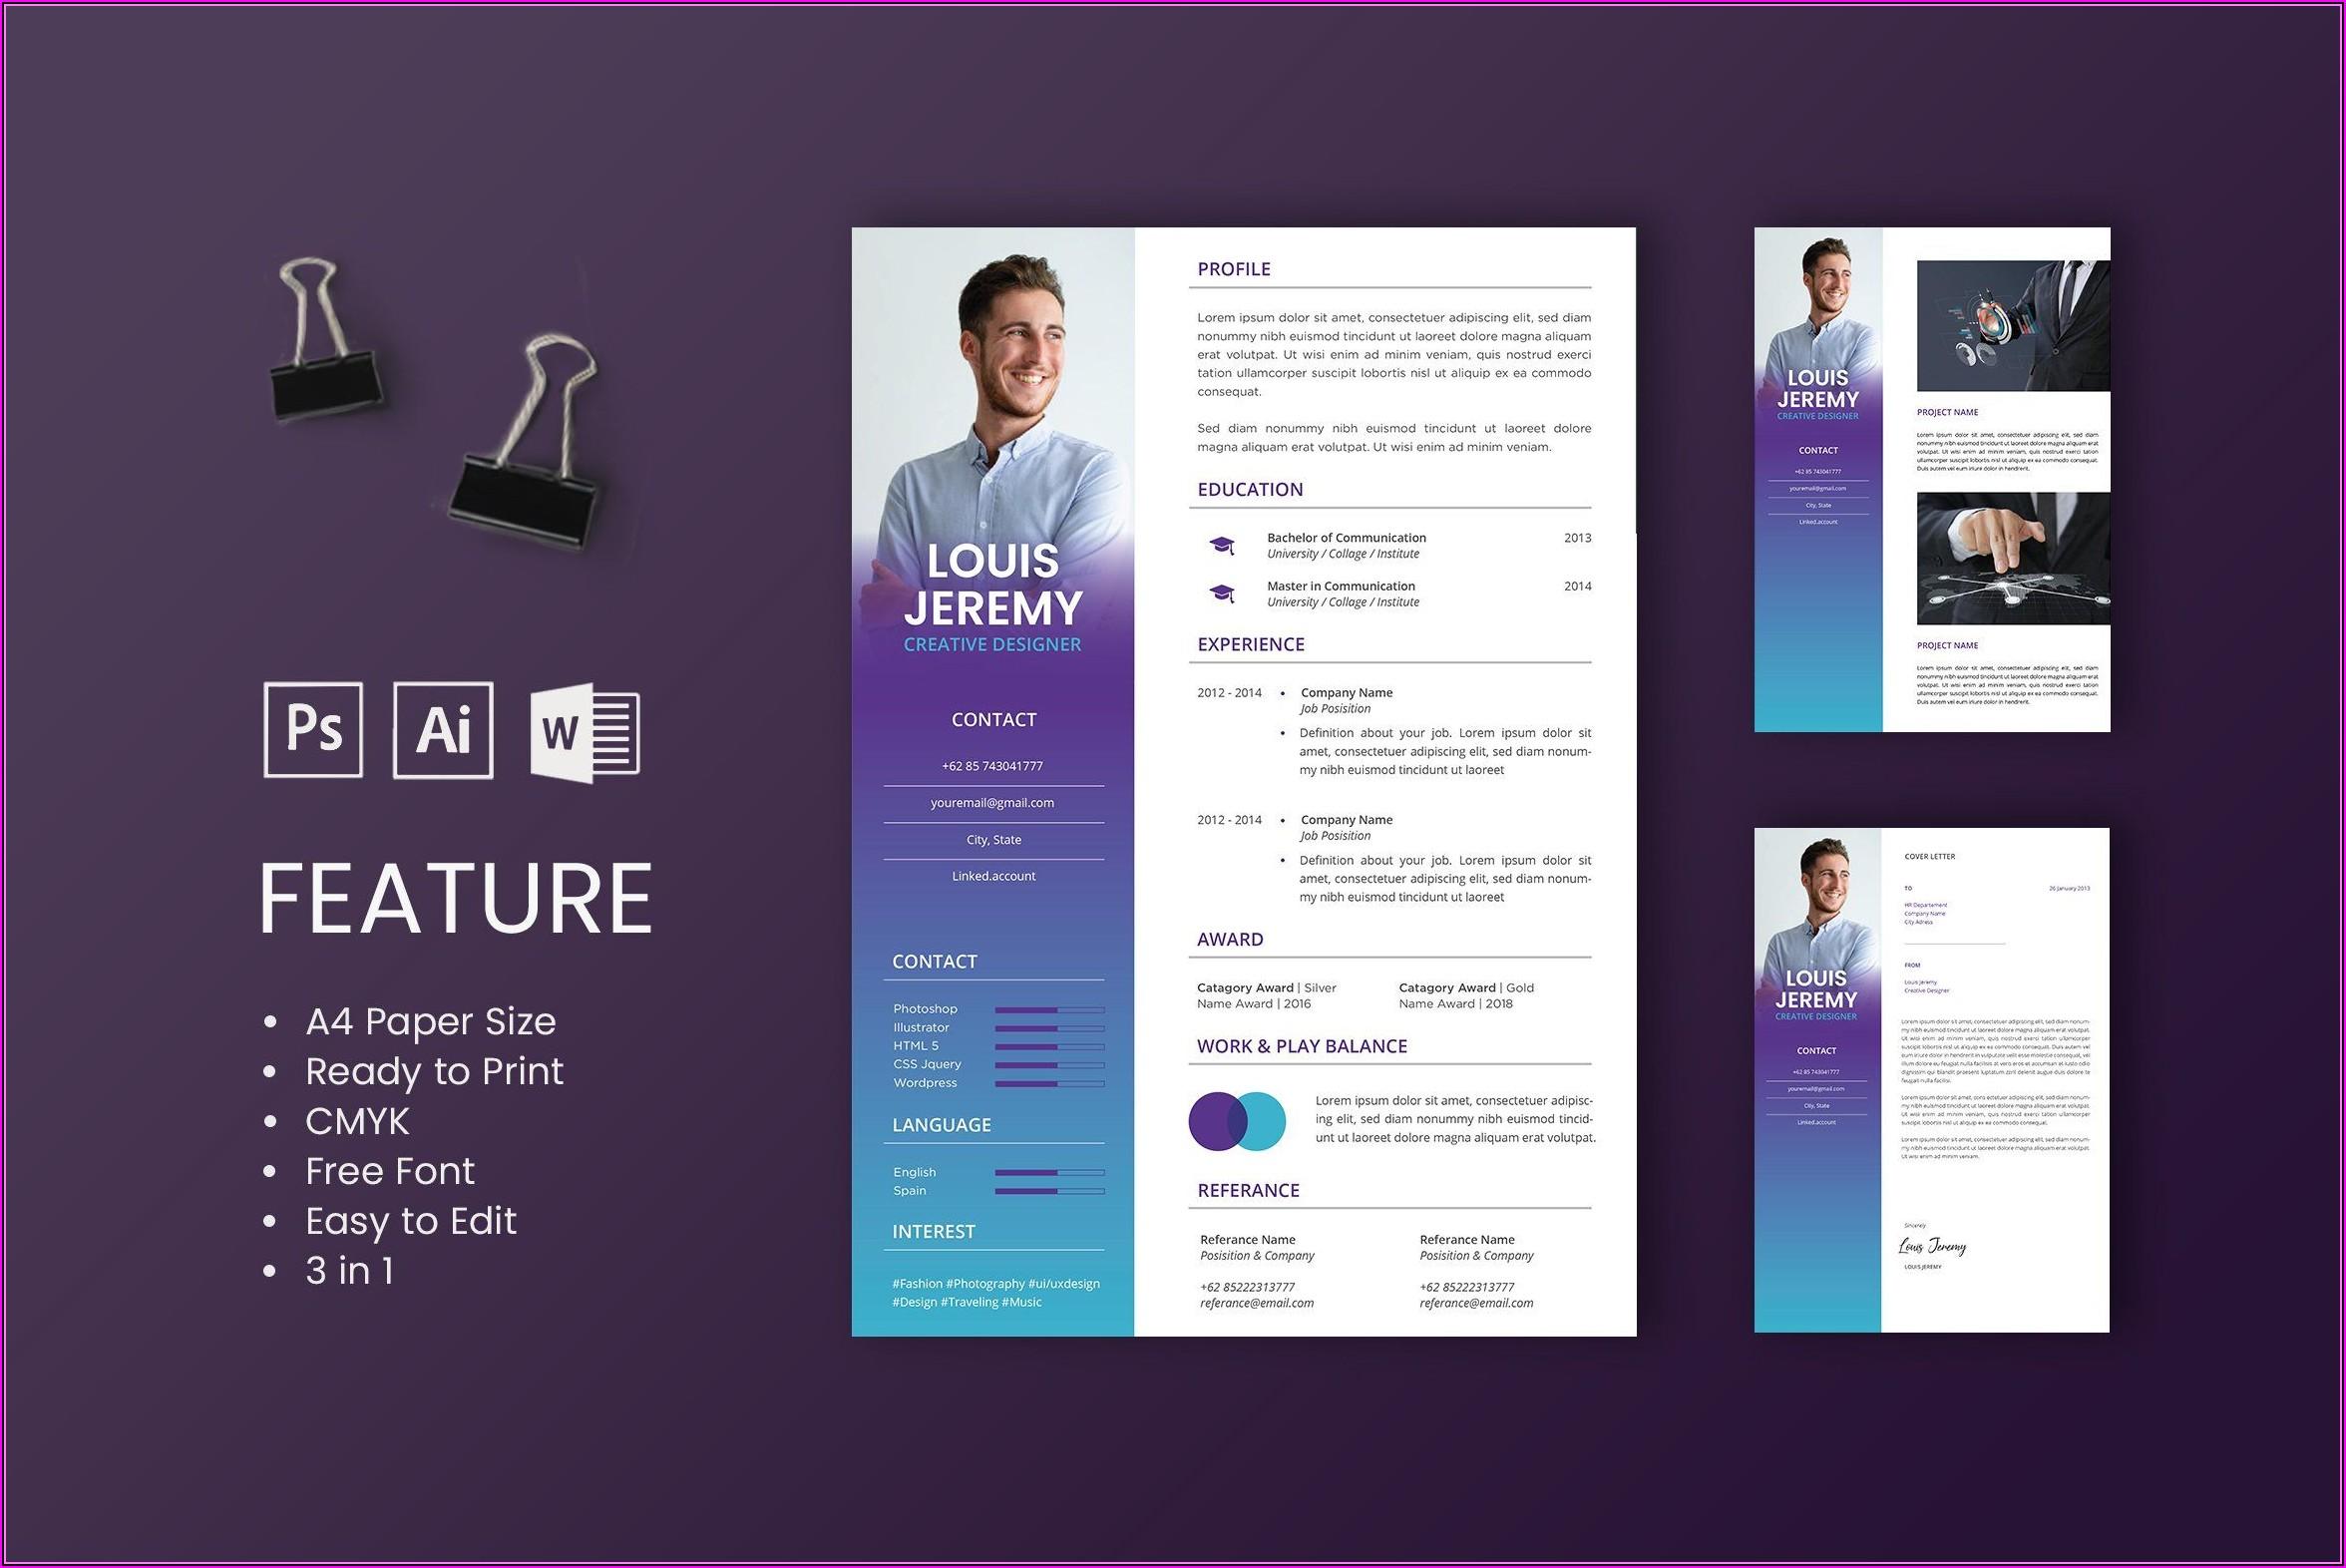 Professional Cv Design Templates